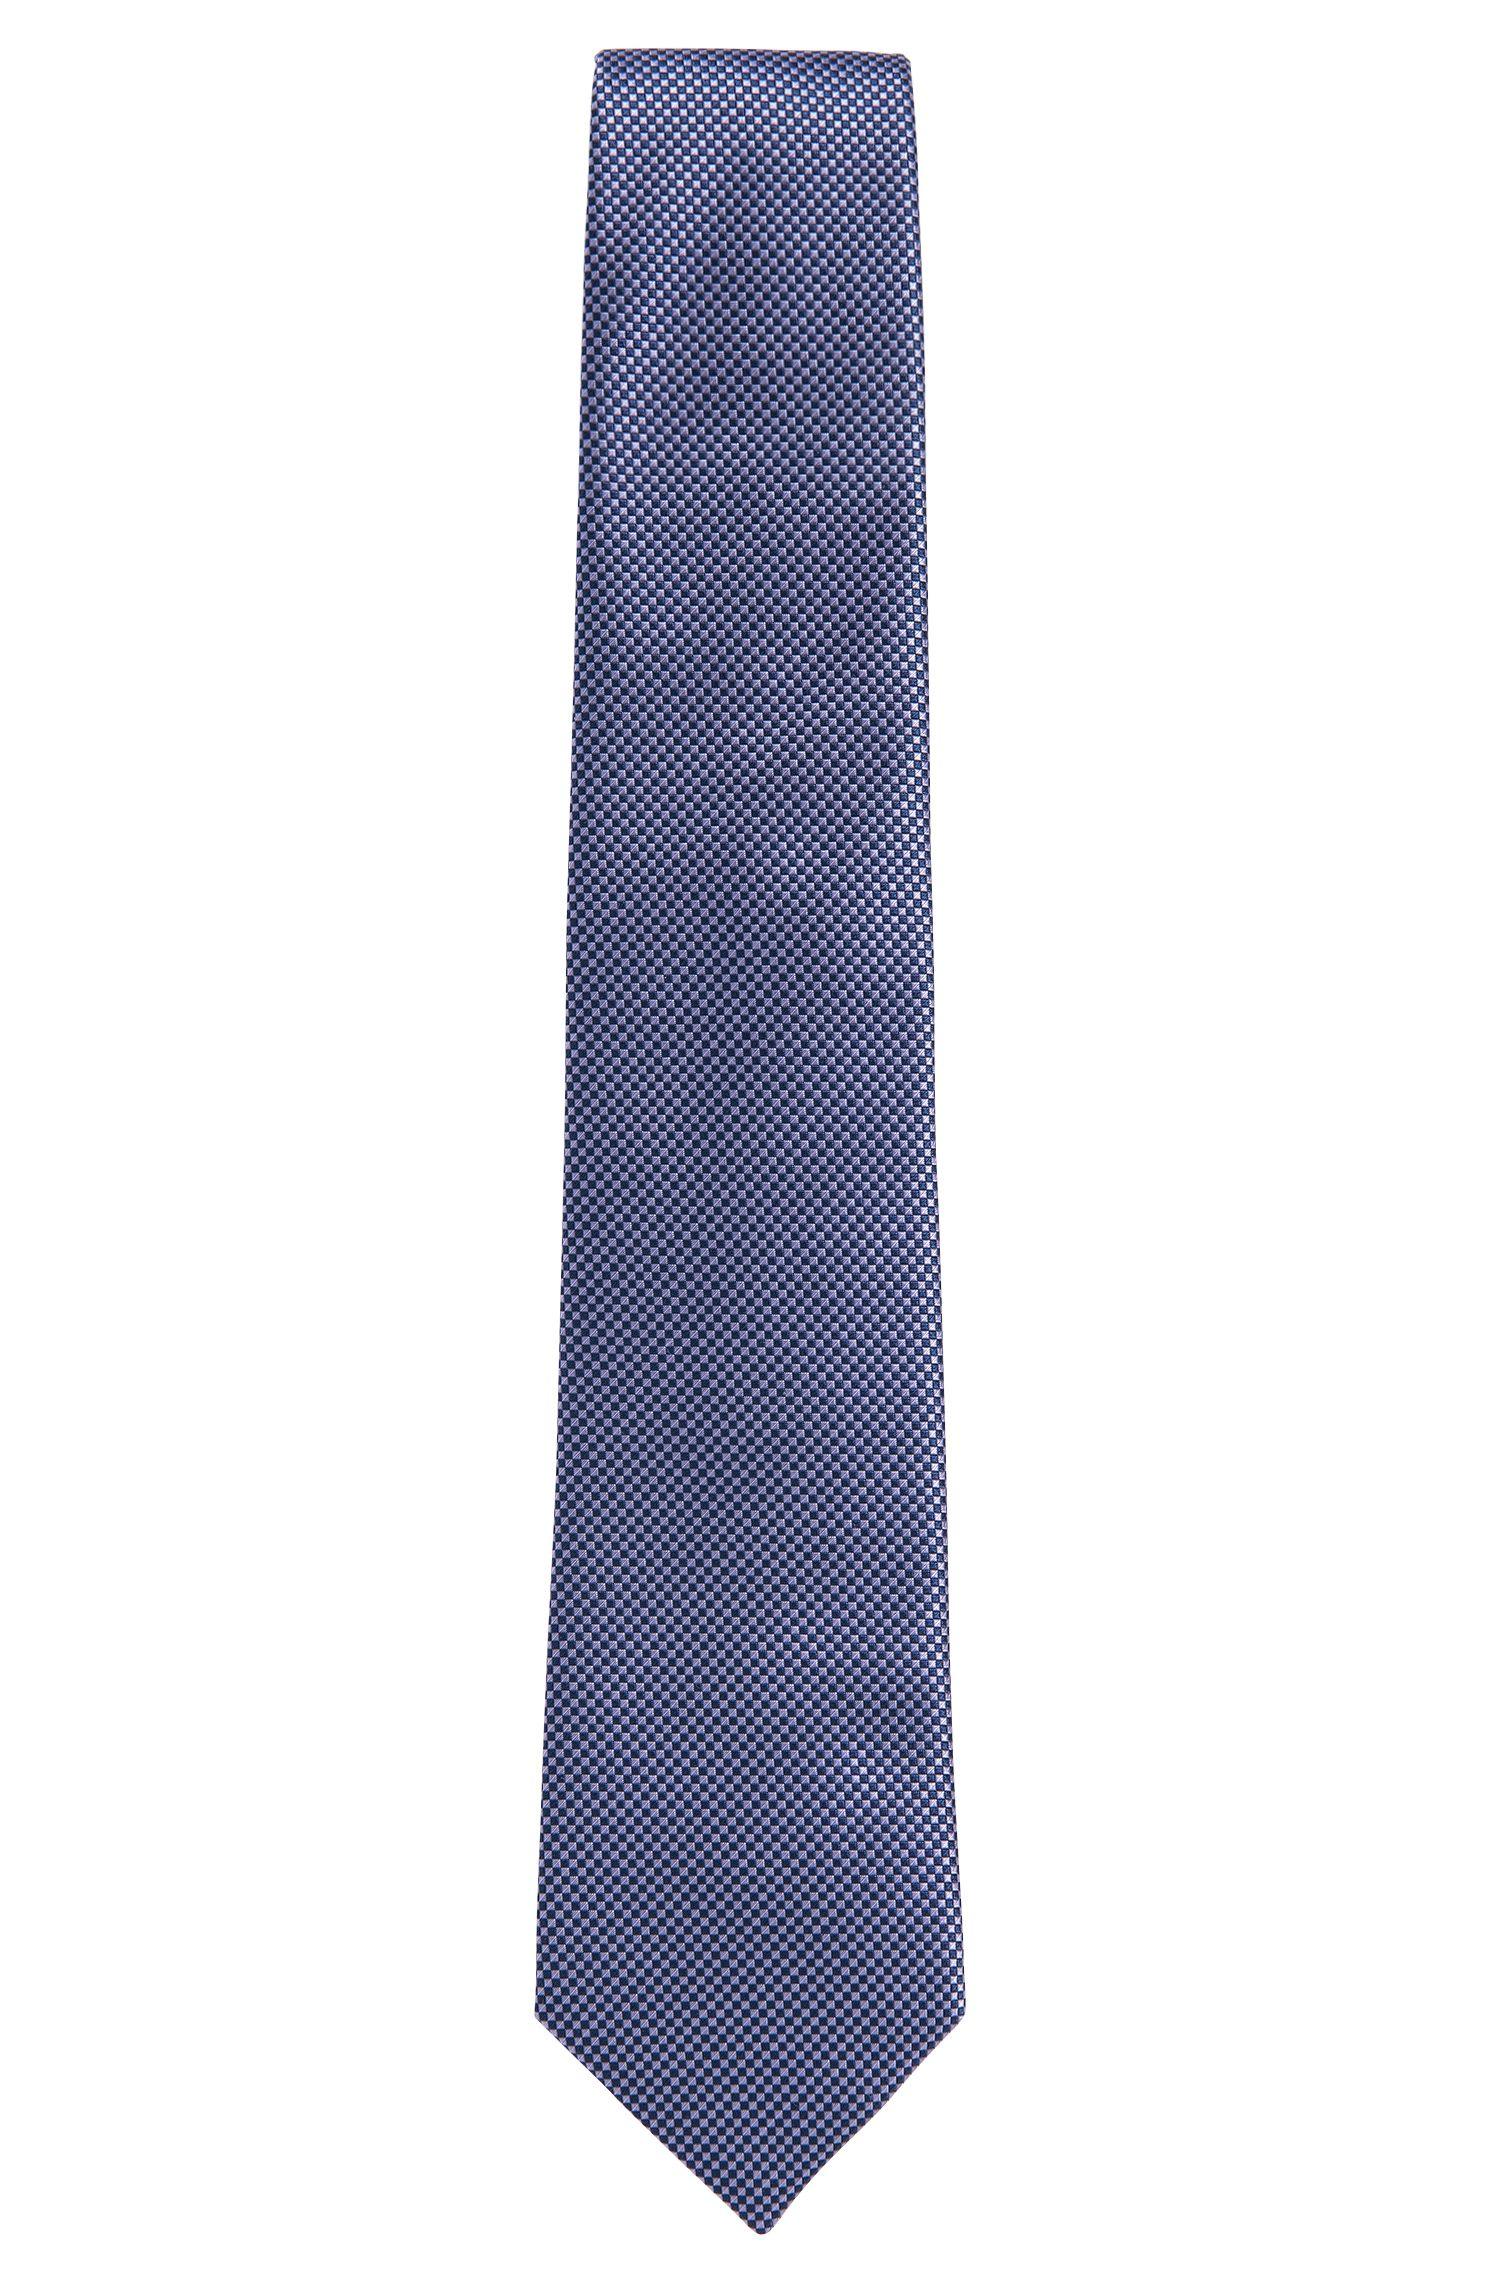 'Tie 7.5 cm'   Regular, Italian Silk Embroidered Tie